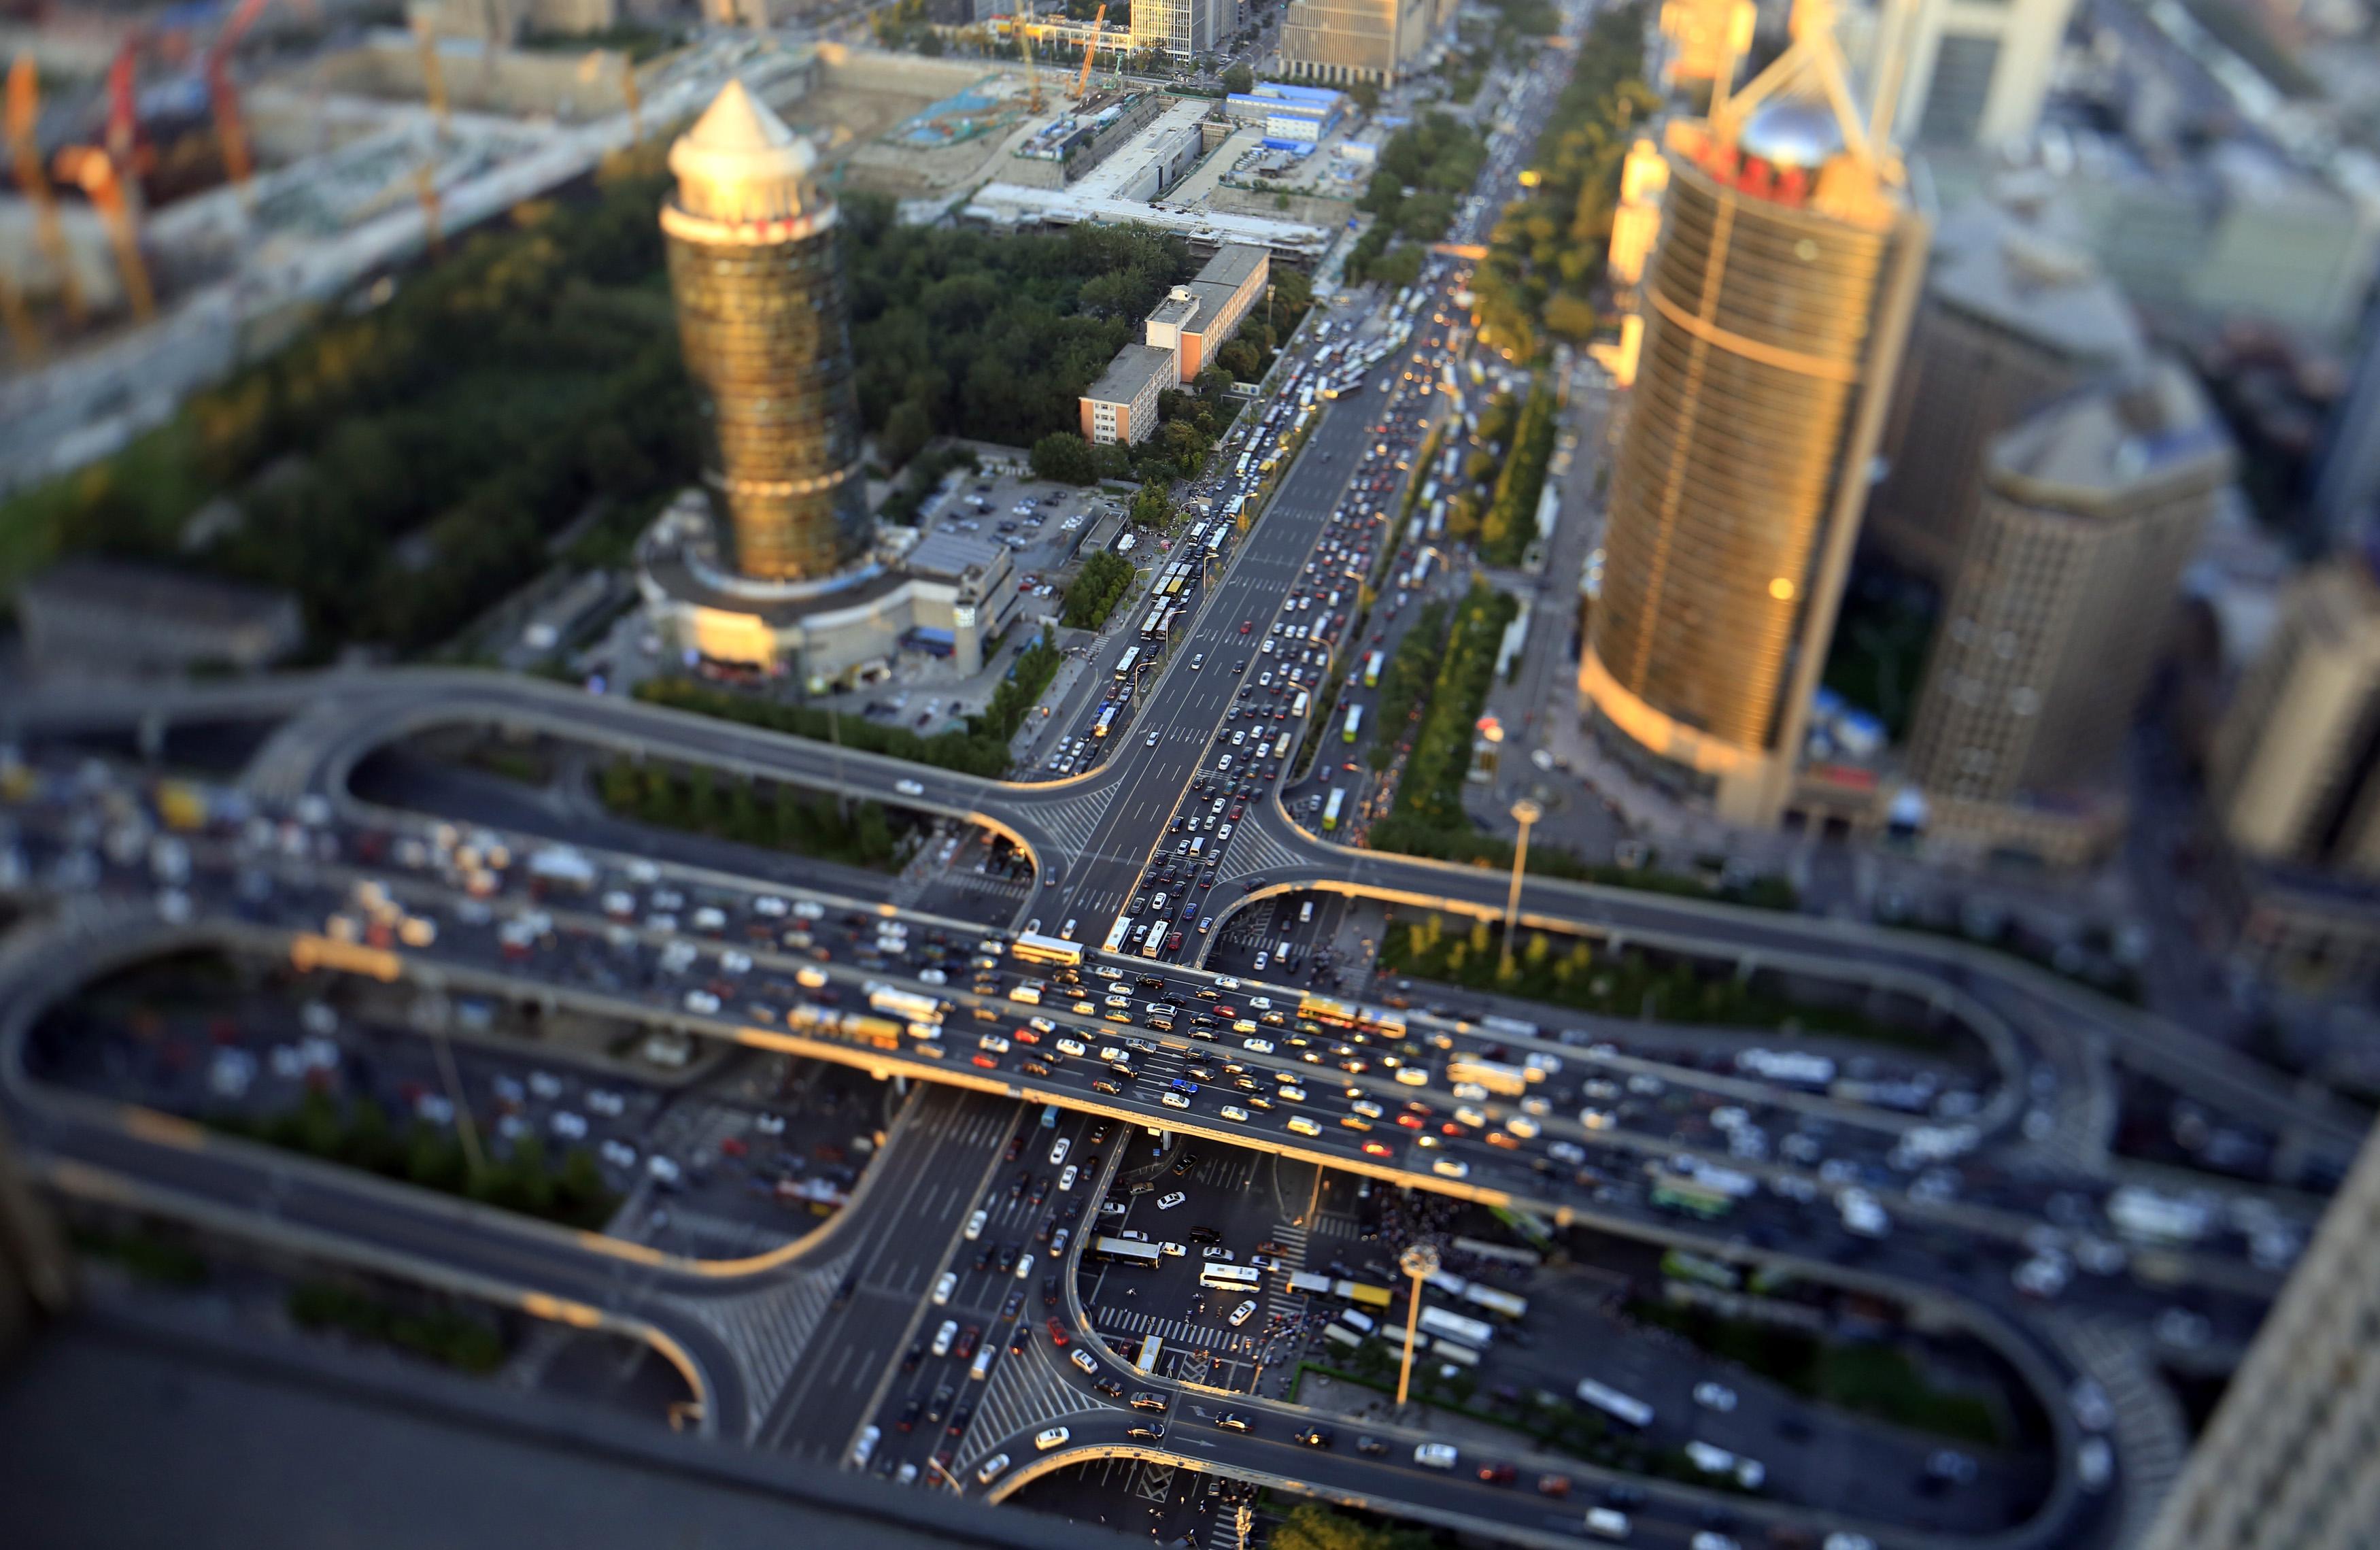 Vehicles drive on the Guomao Bridge during the evening rush hour in Beijing, September 3, 2014. Picture taken using a tilt shift lens.